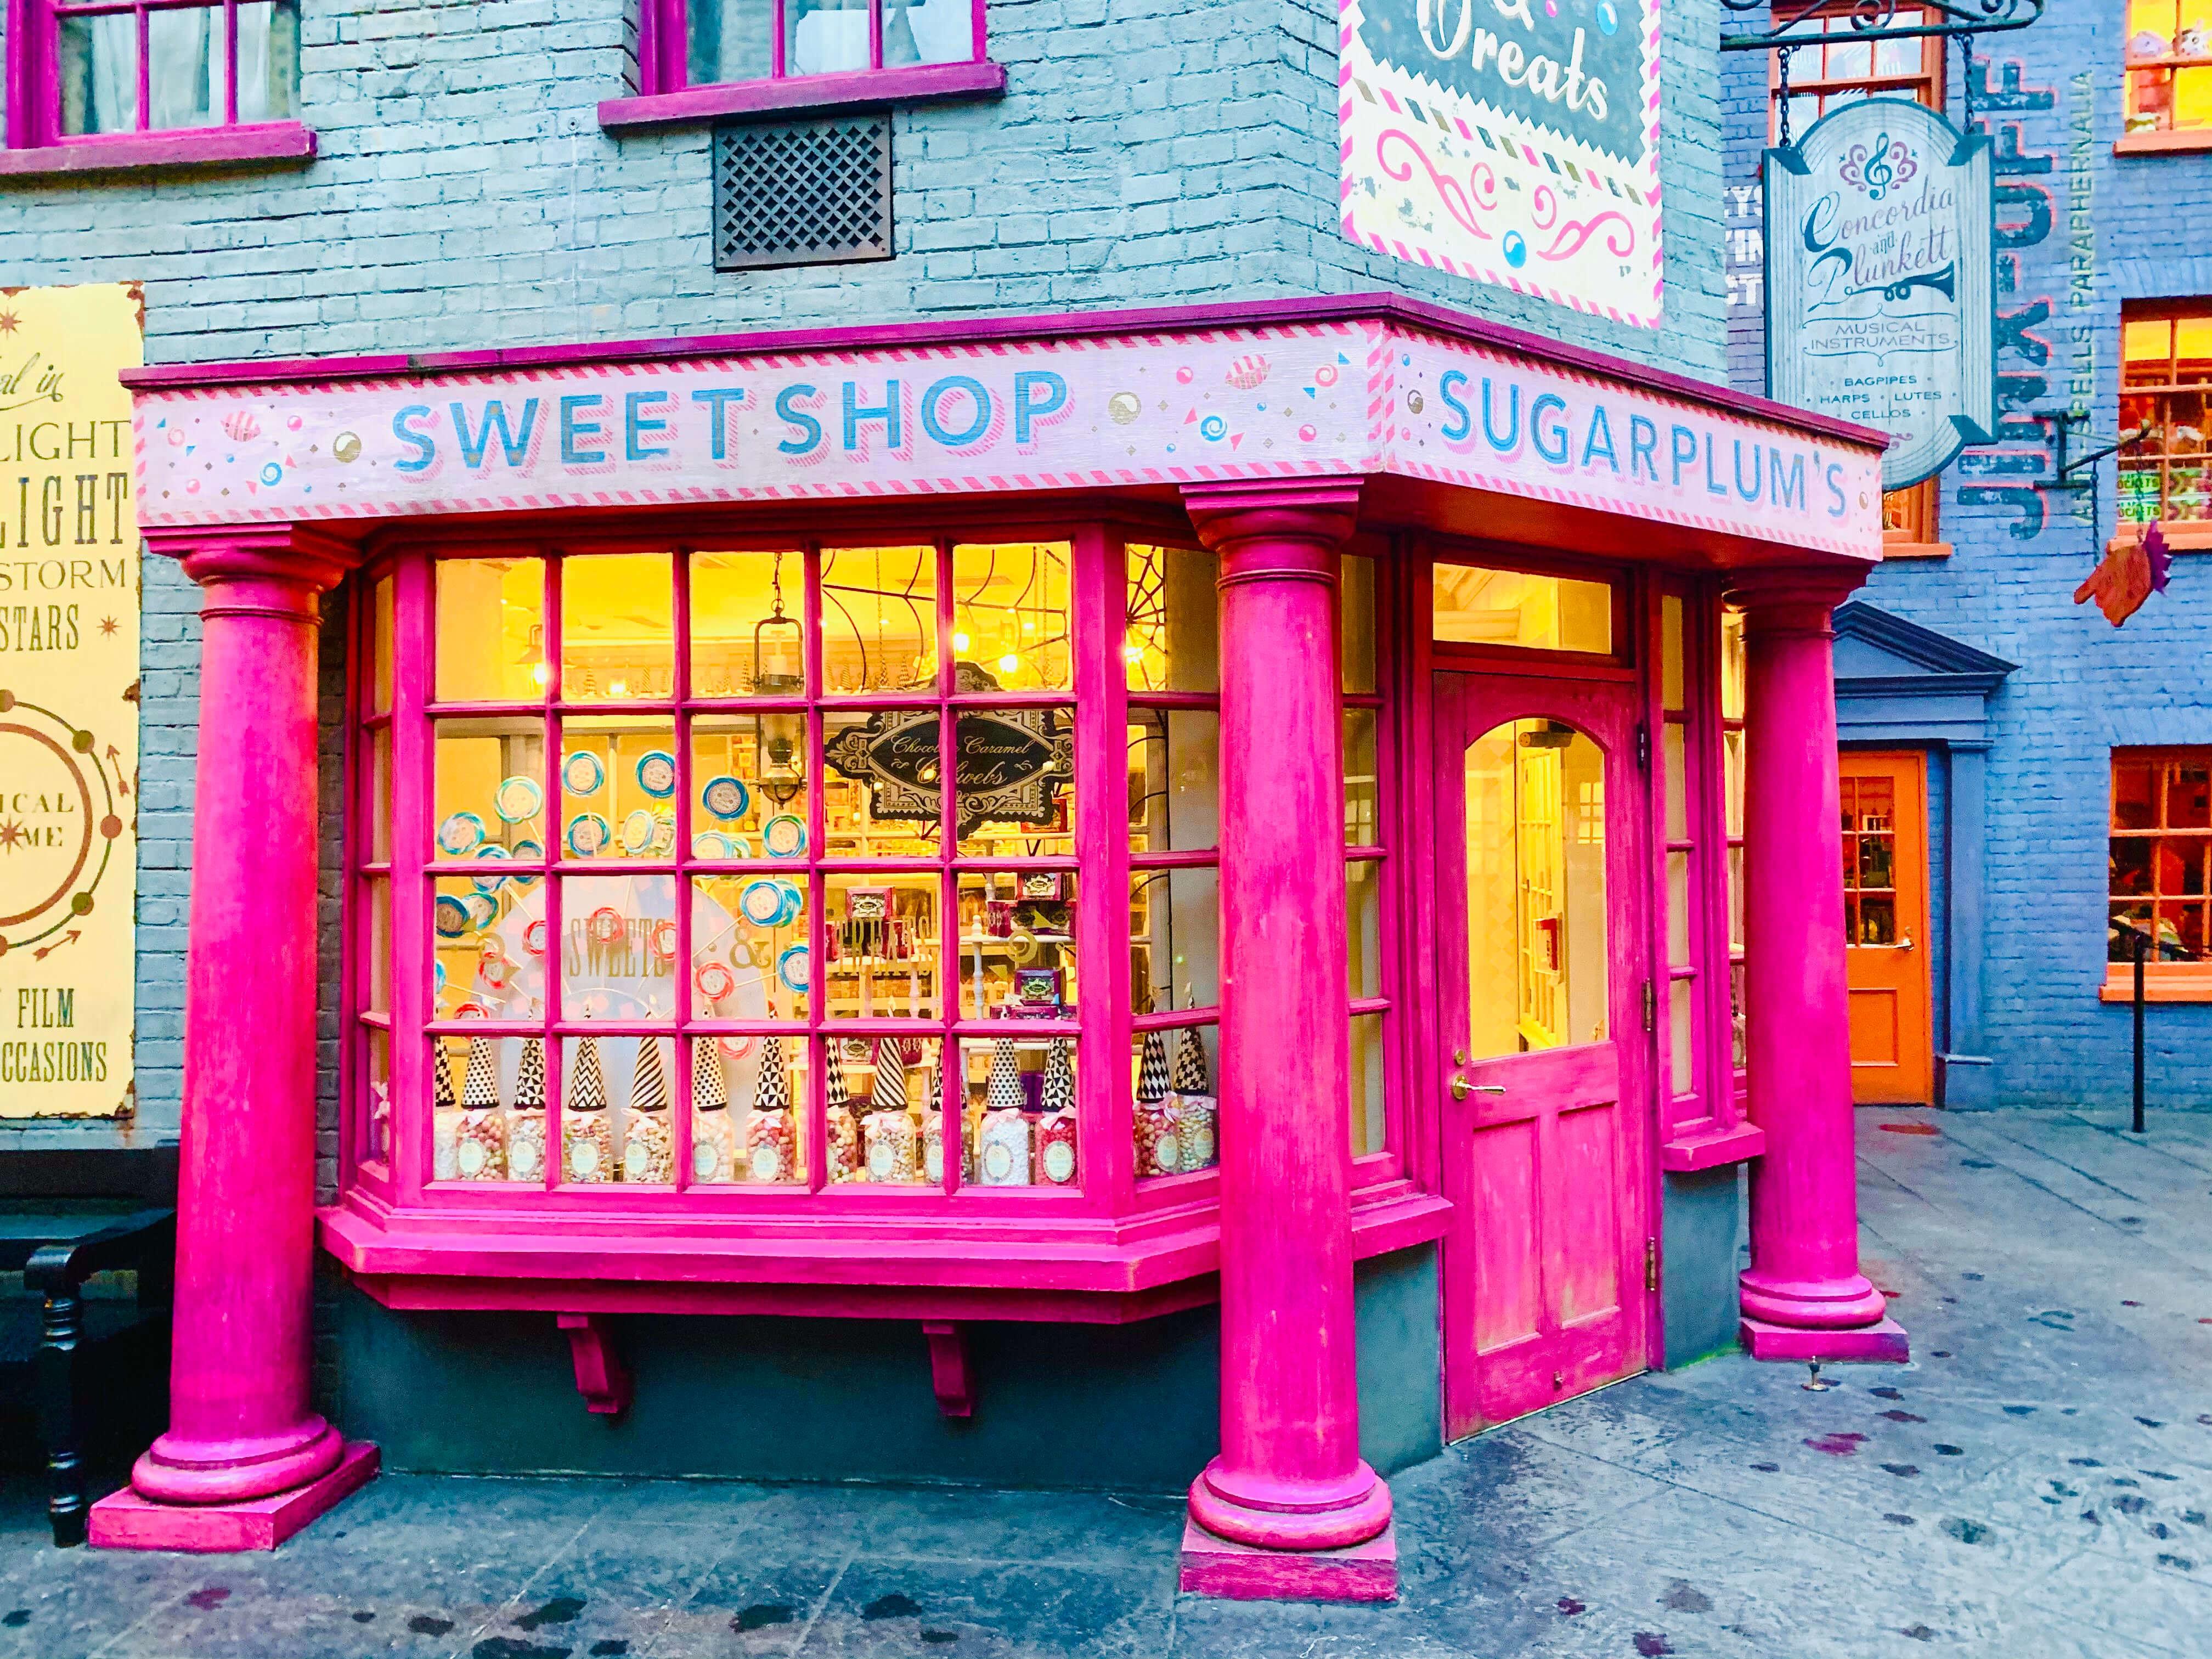 Harry Potter World shops